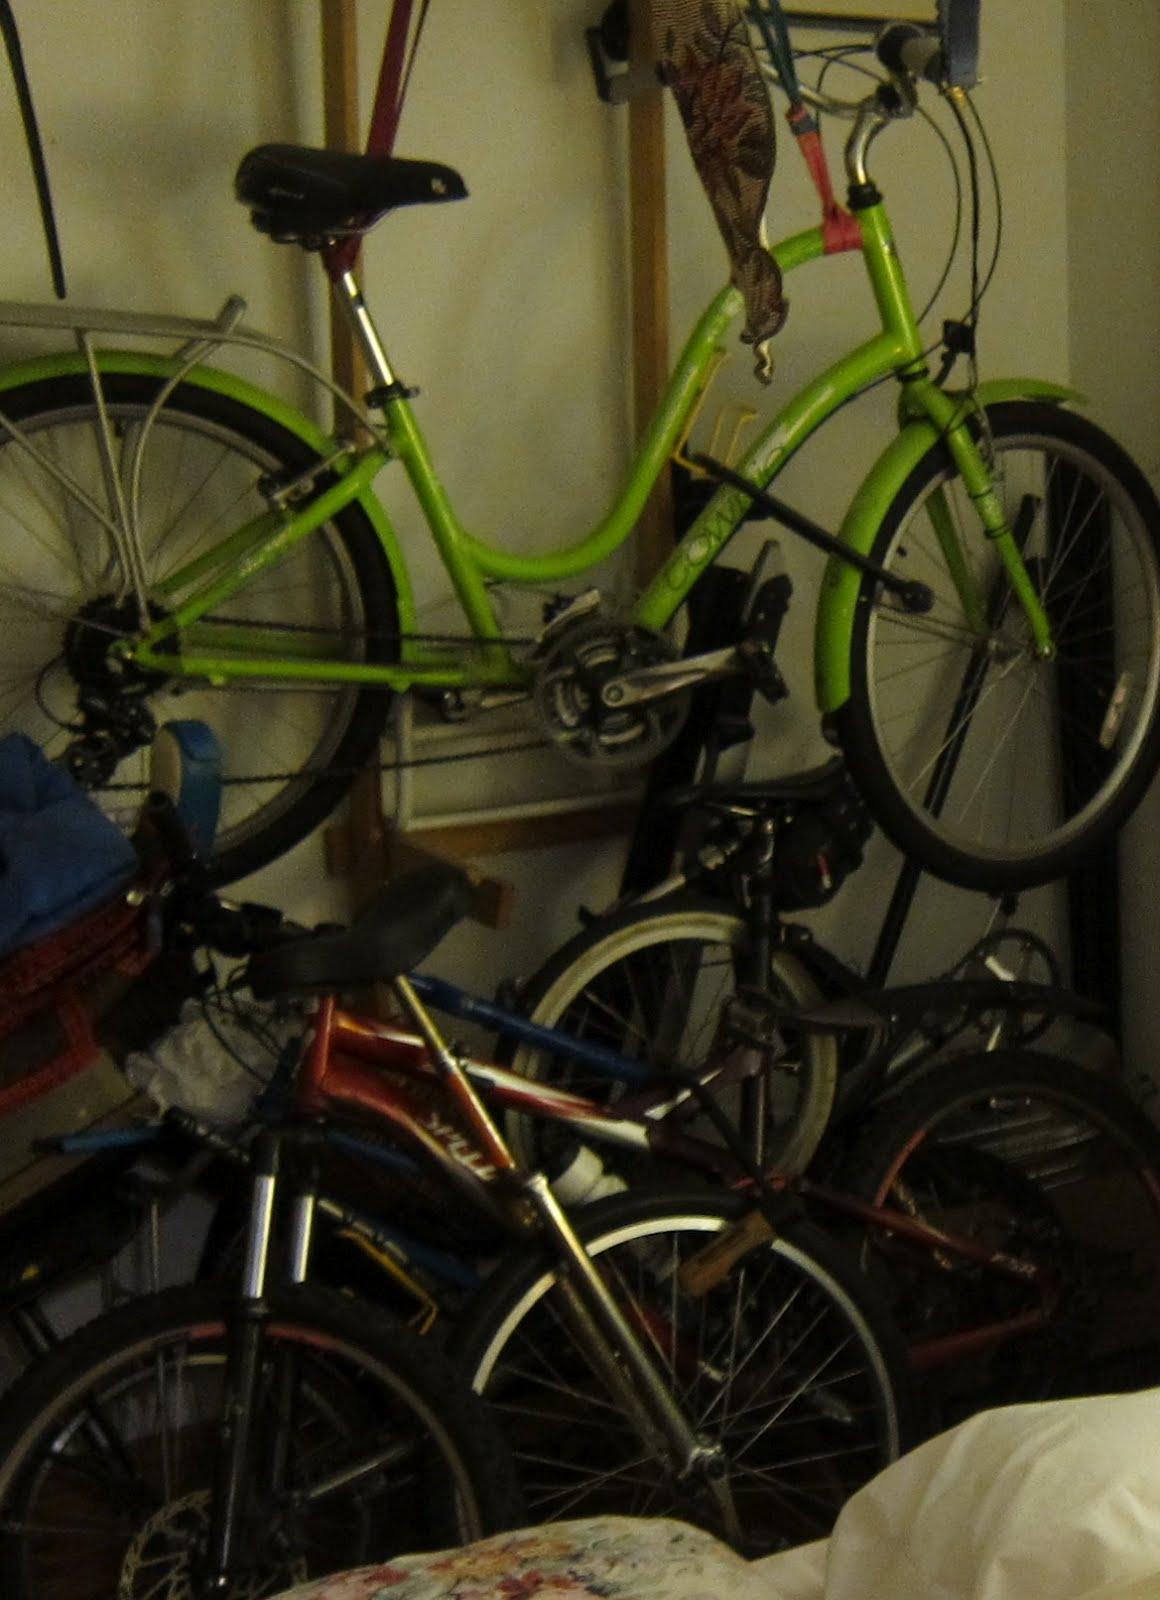 winter bike storage a.k.a. the bedroom problem & Cycle Fun Montreal: winter bike storage a.k.a. the bedroom problem